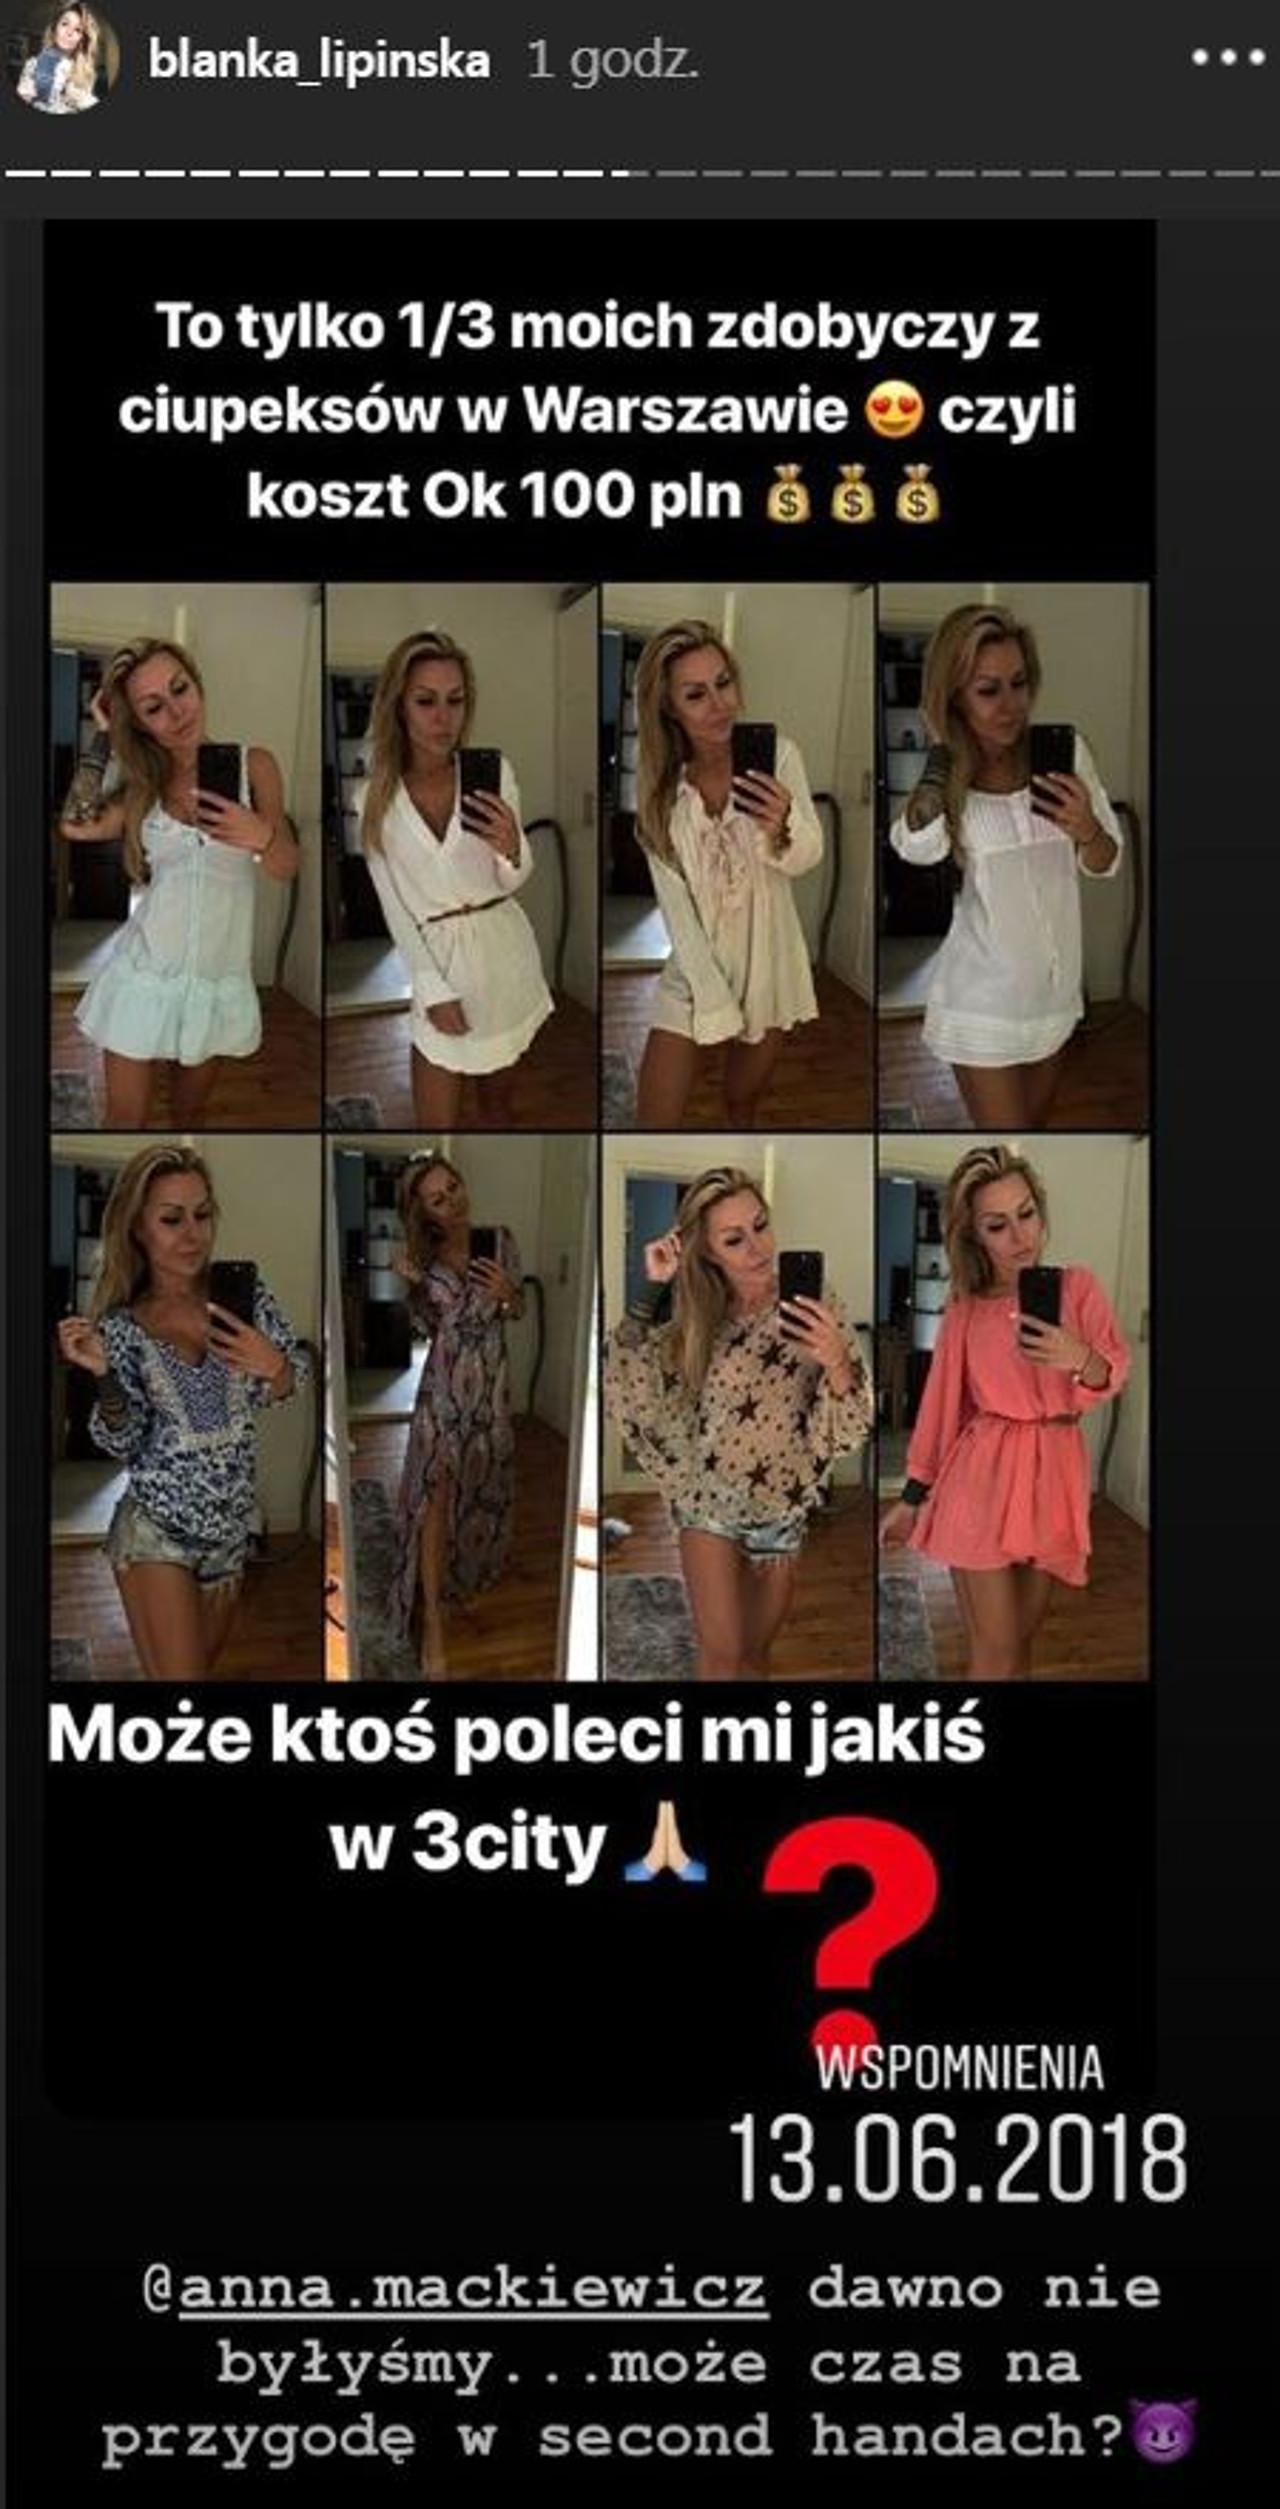 Blanka Lipińska kupuje ubrania w second-handach.